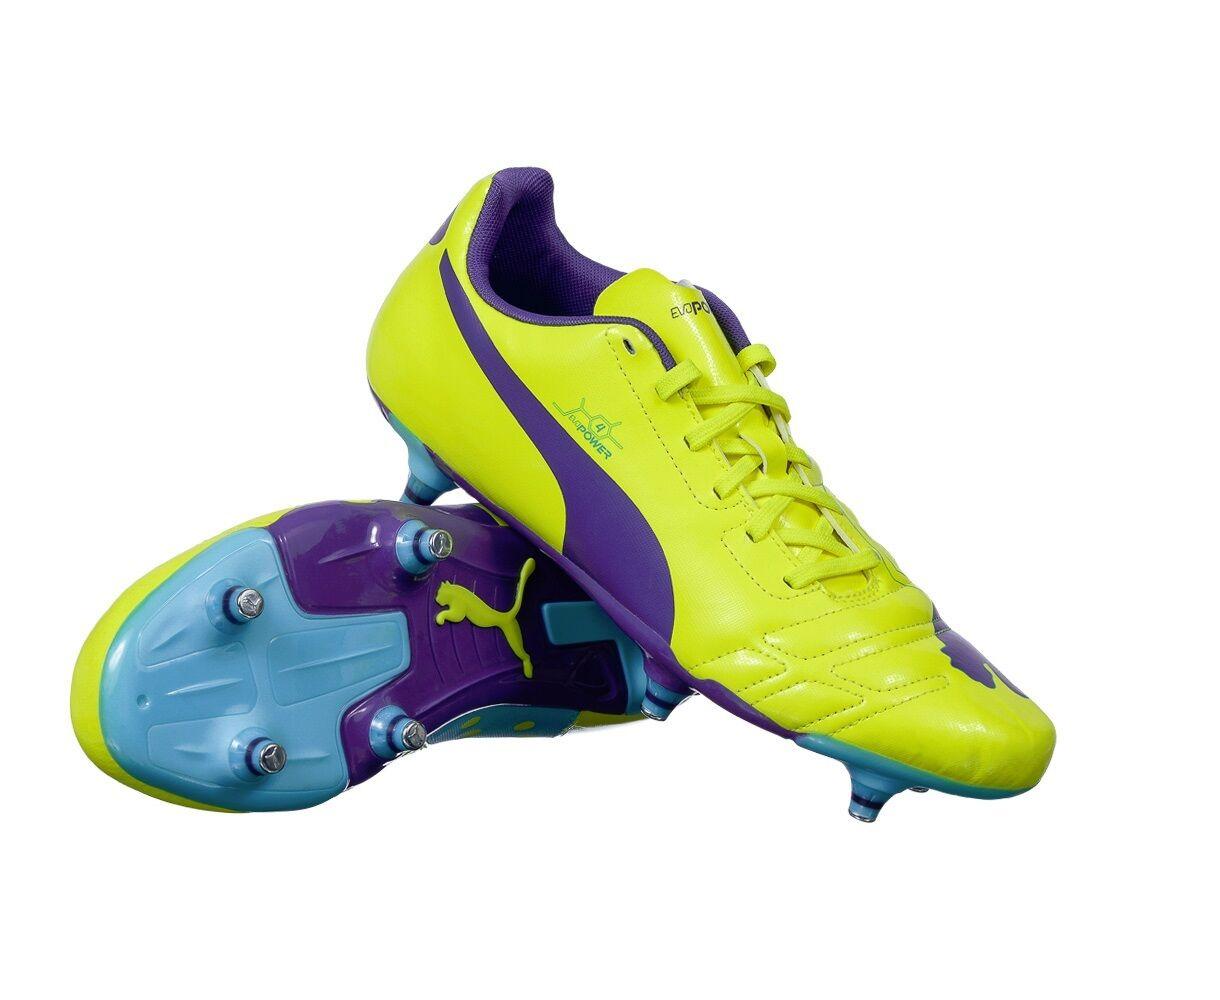 PUMA EVOPOWER 4 - MENS SOFT GROUND FOOTBALL BOOTS - 102954 02 - BRAND NEW